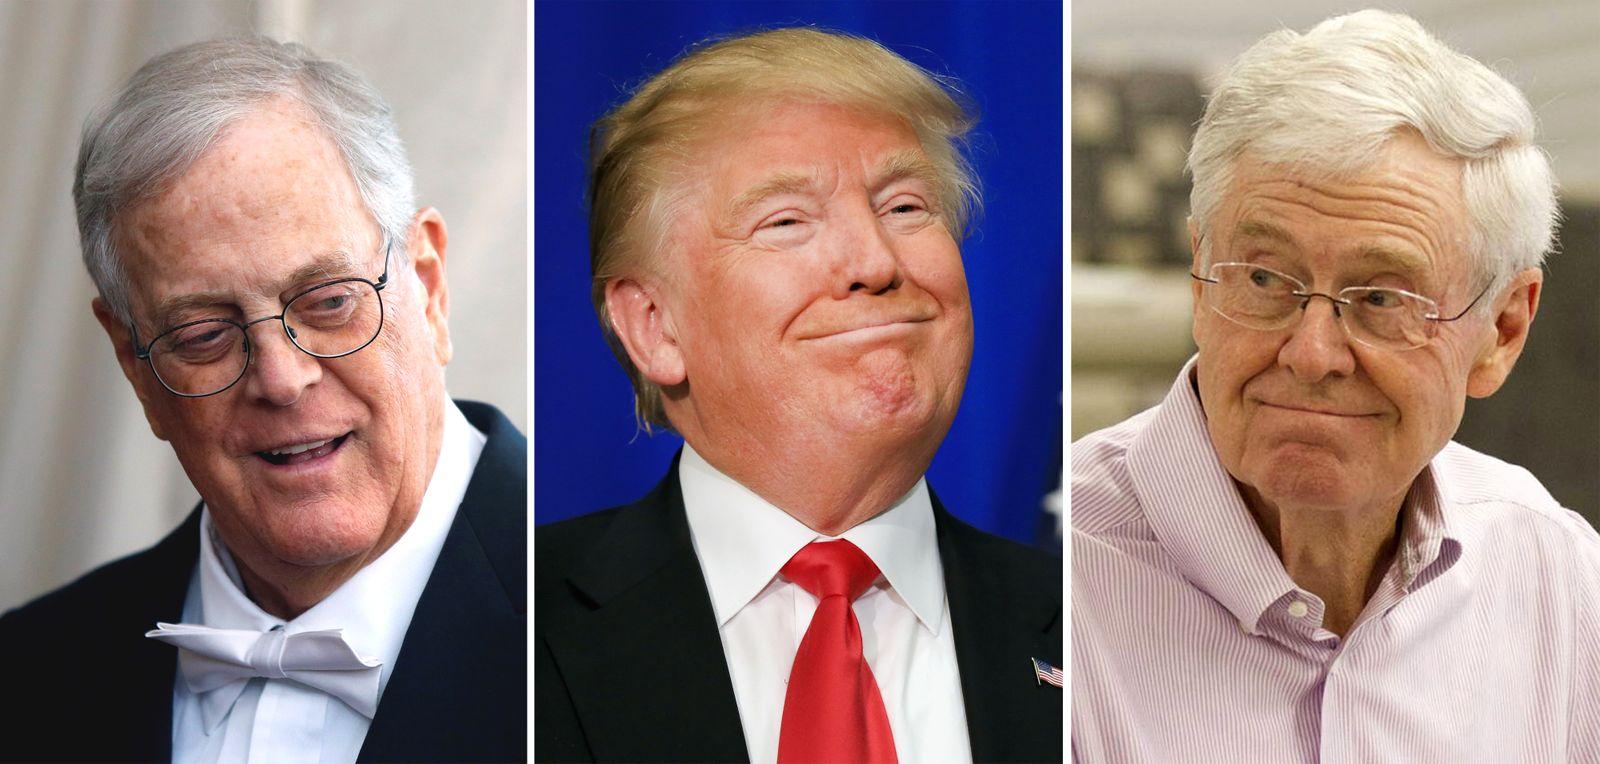 EINMALIGE VERWENDUNG KOMBO David Koch / Donald Trump / Charles Koch